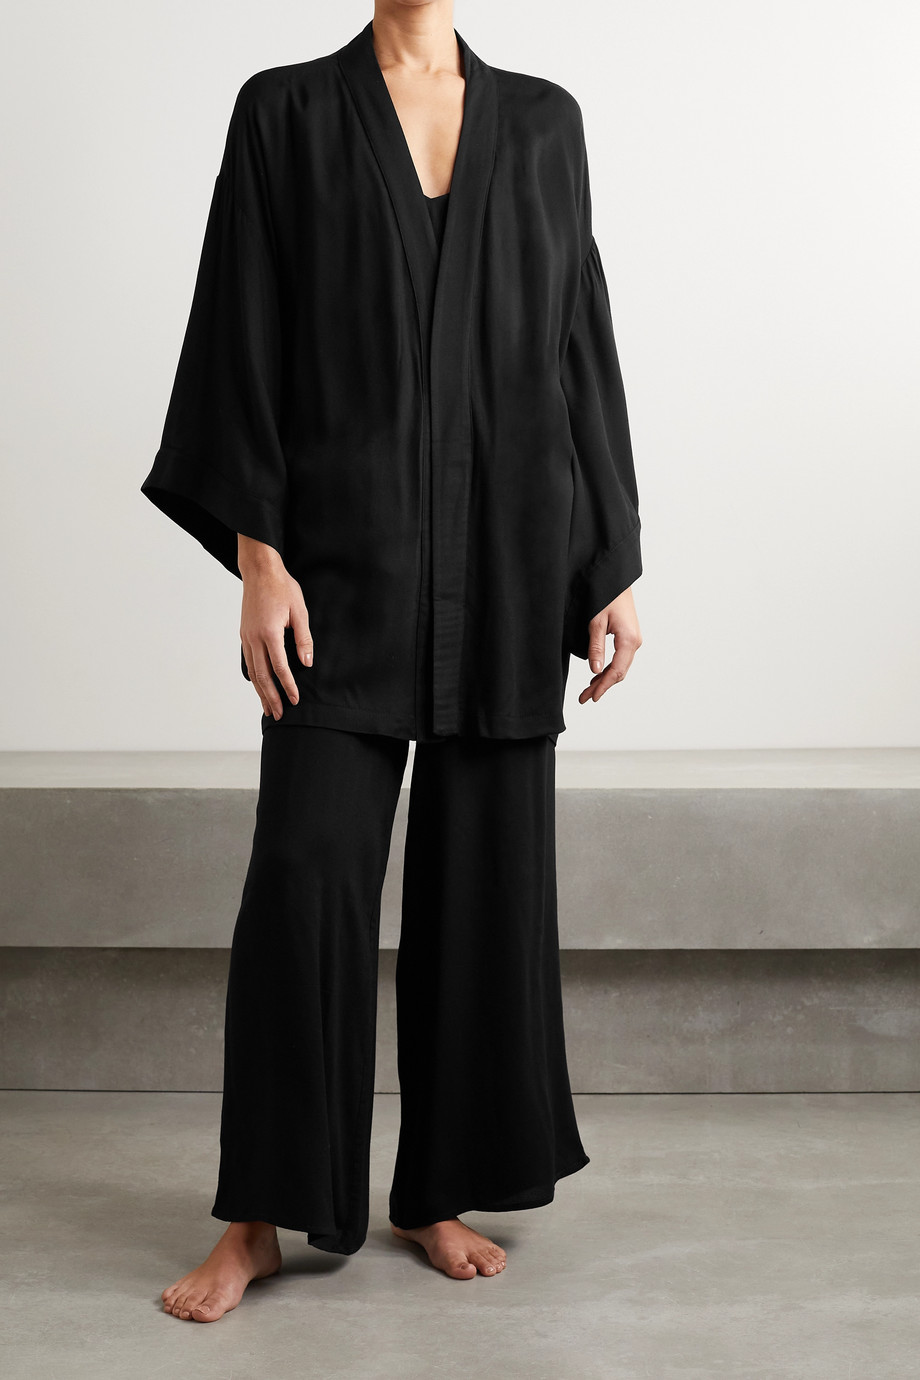 Marika Vera Elle Set aus Pyjama und Morgenmantel aus Crêpe